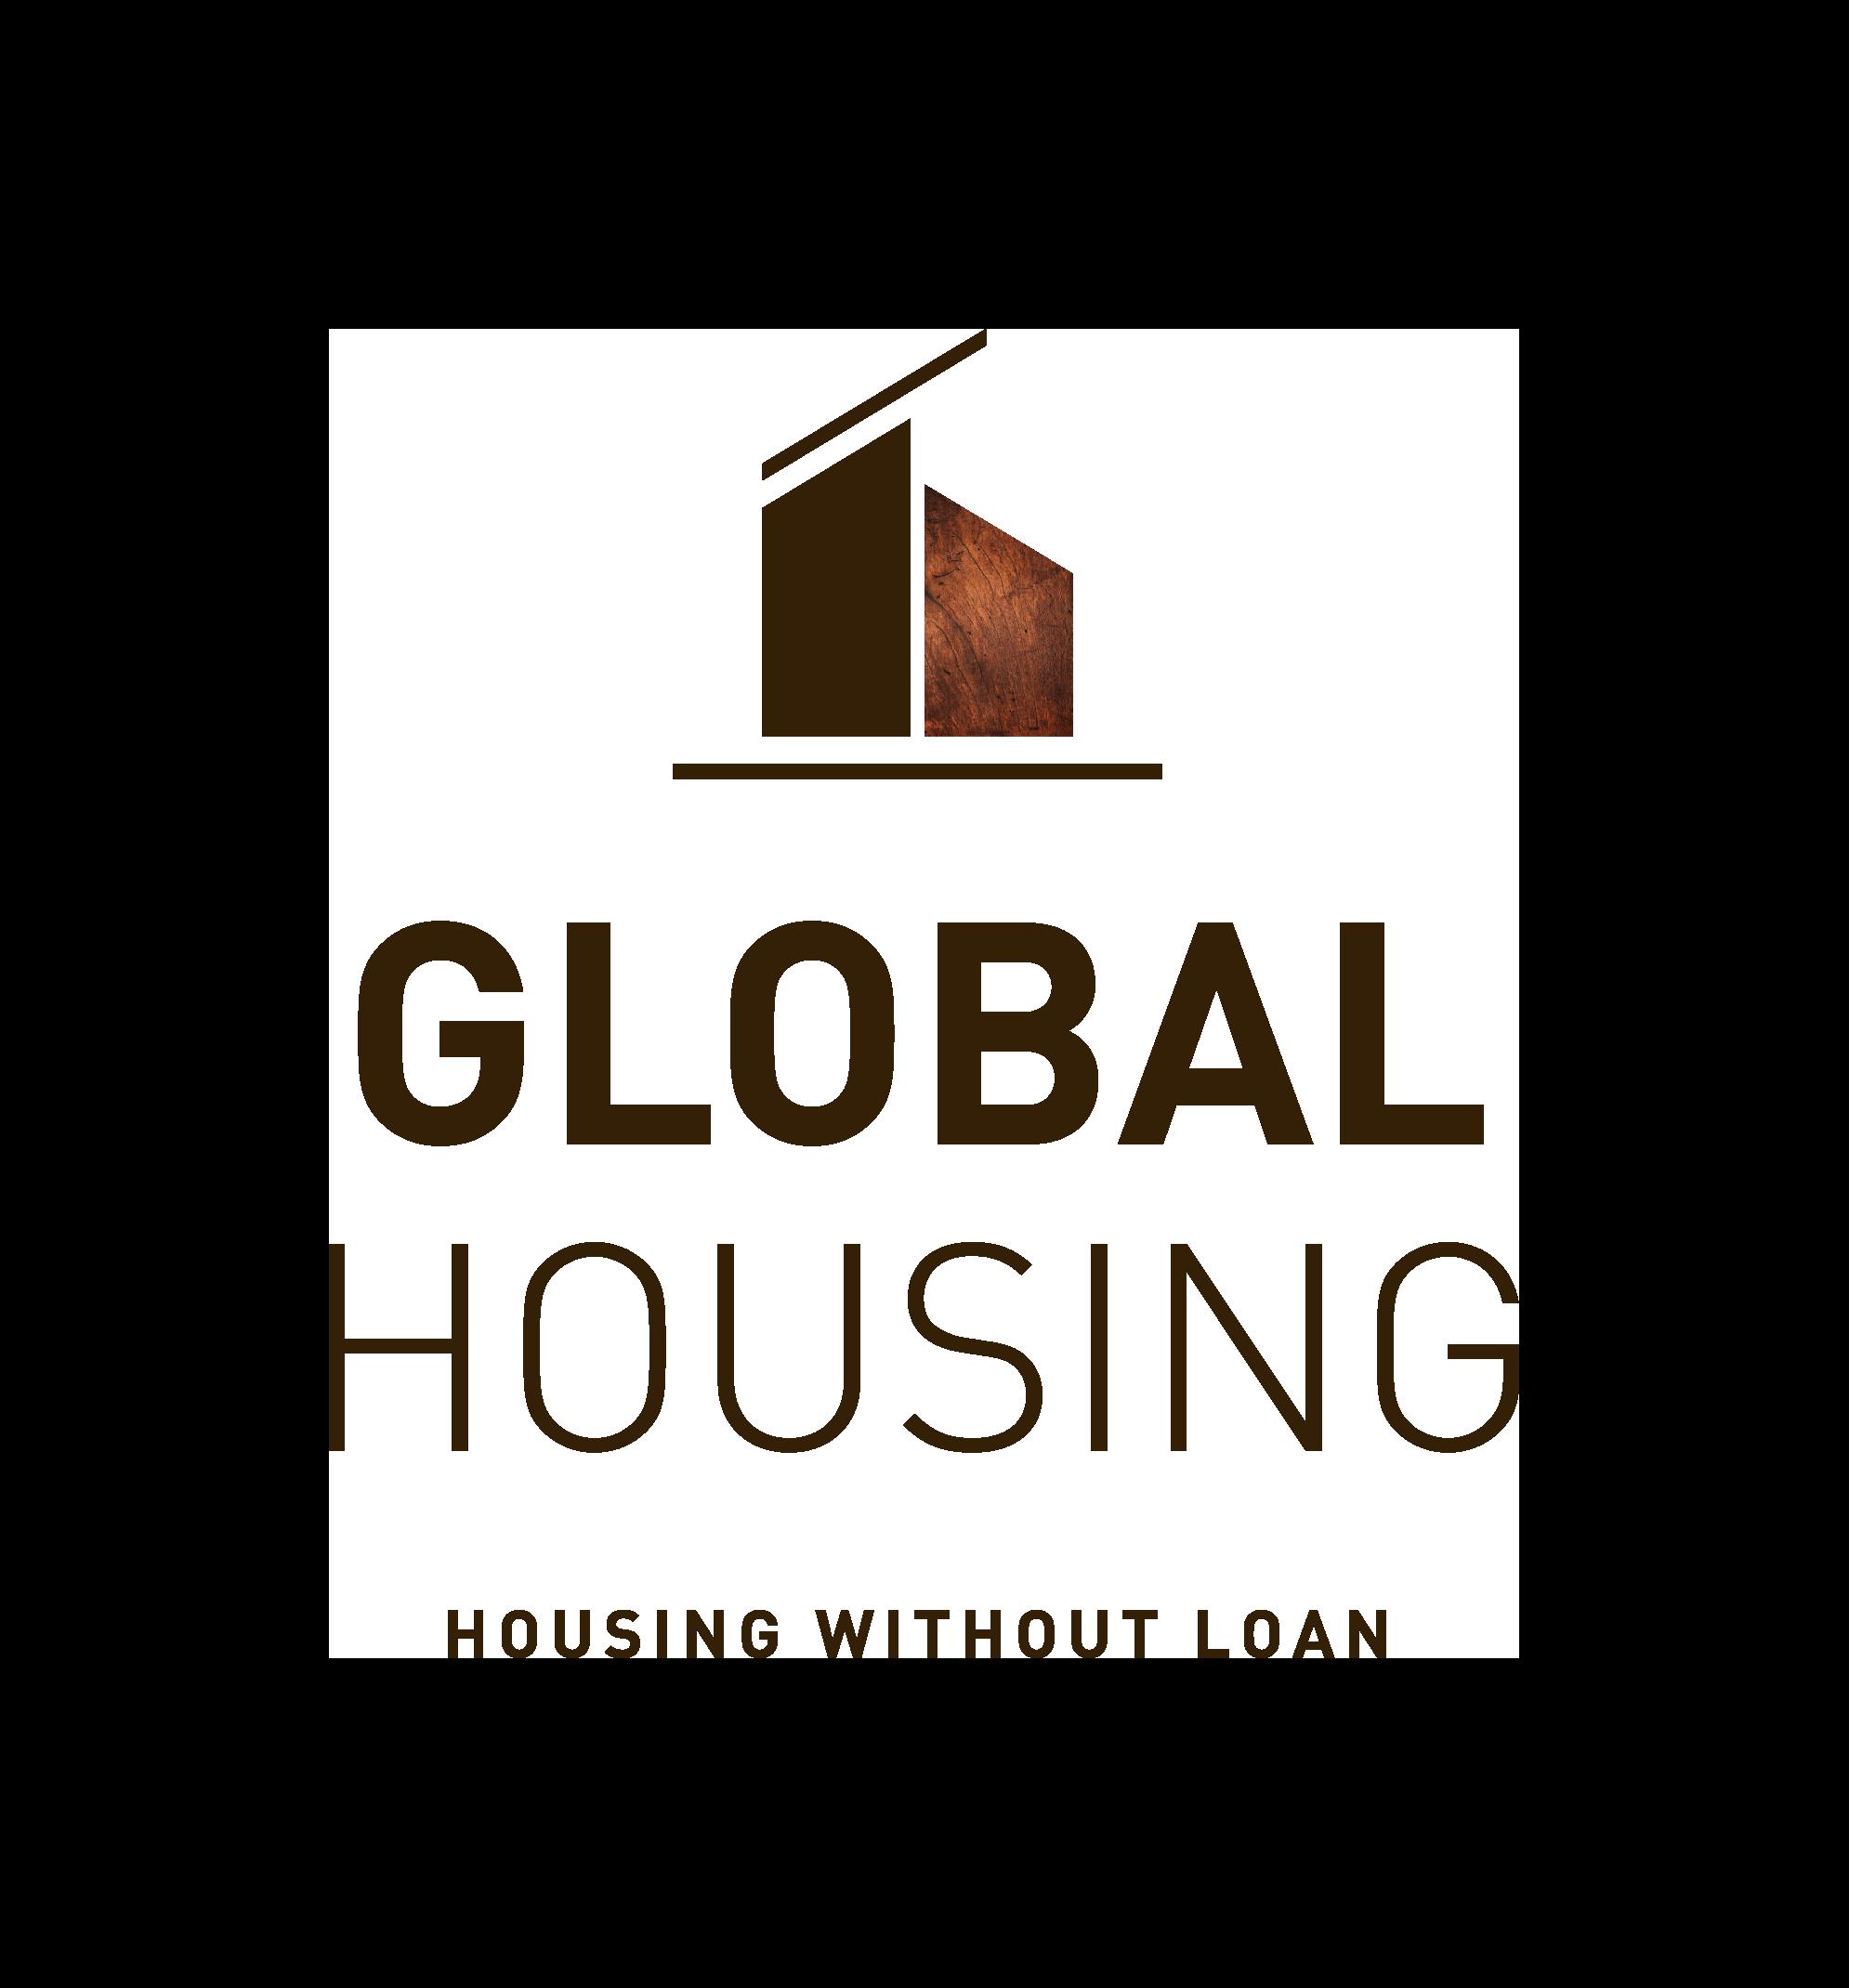 Global Housing